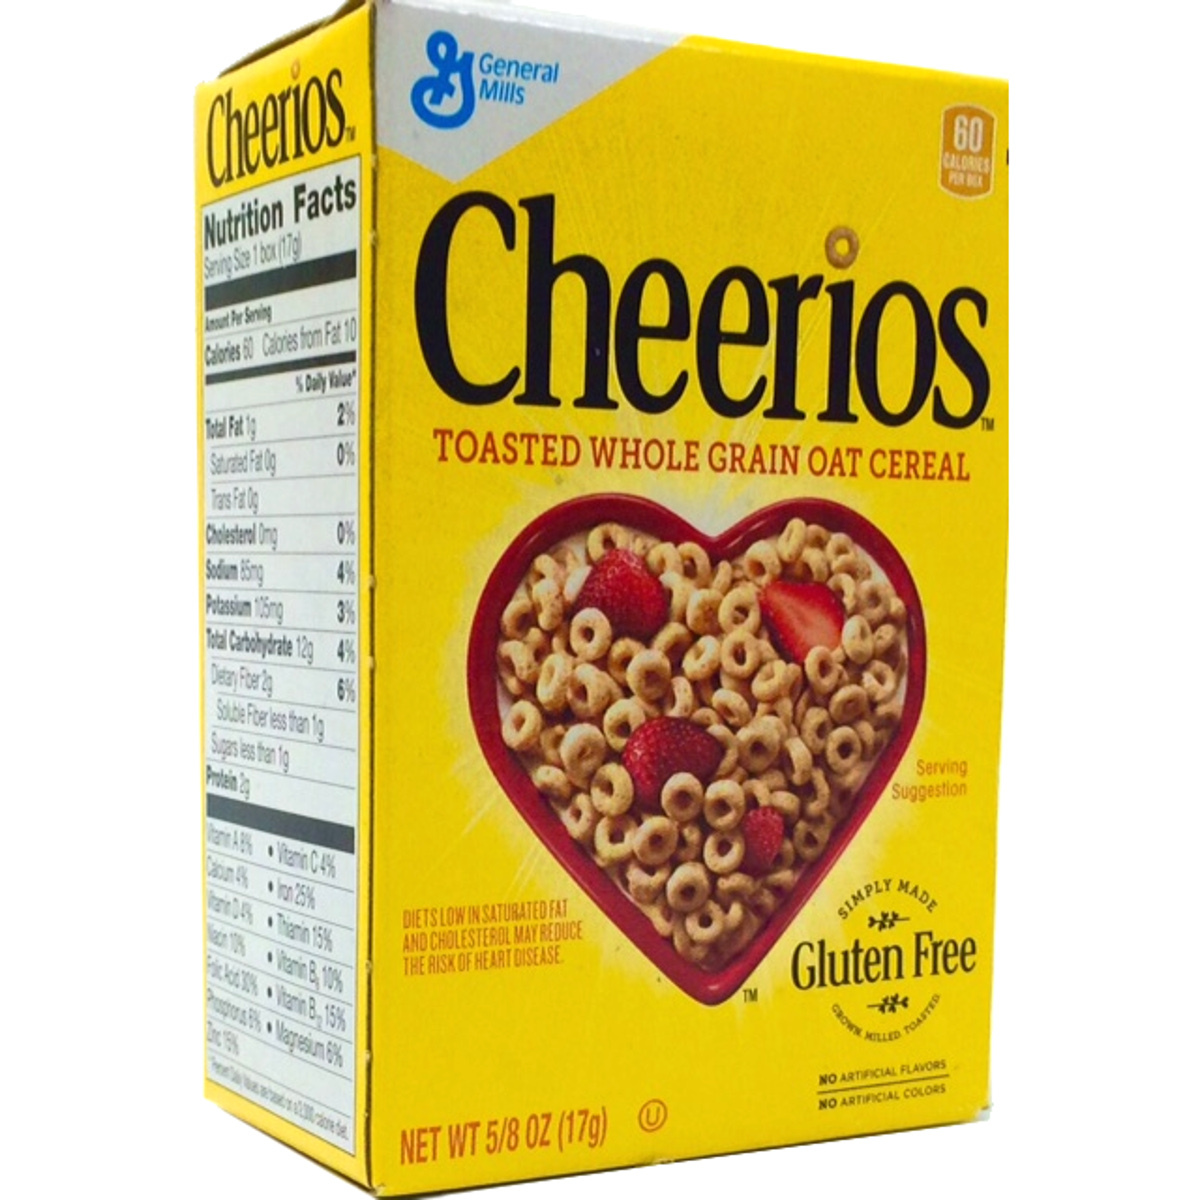 Wholesale General Mills Cheerios Cereal Box (SKU 362151